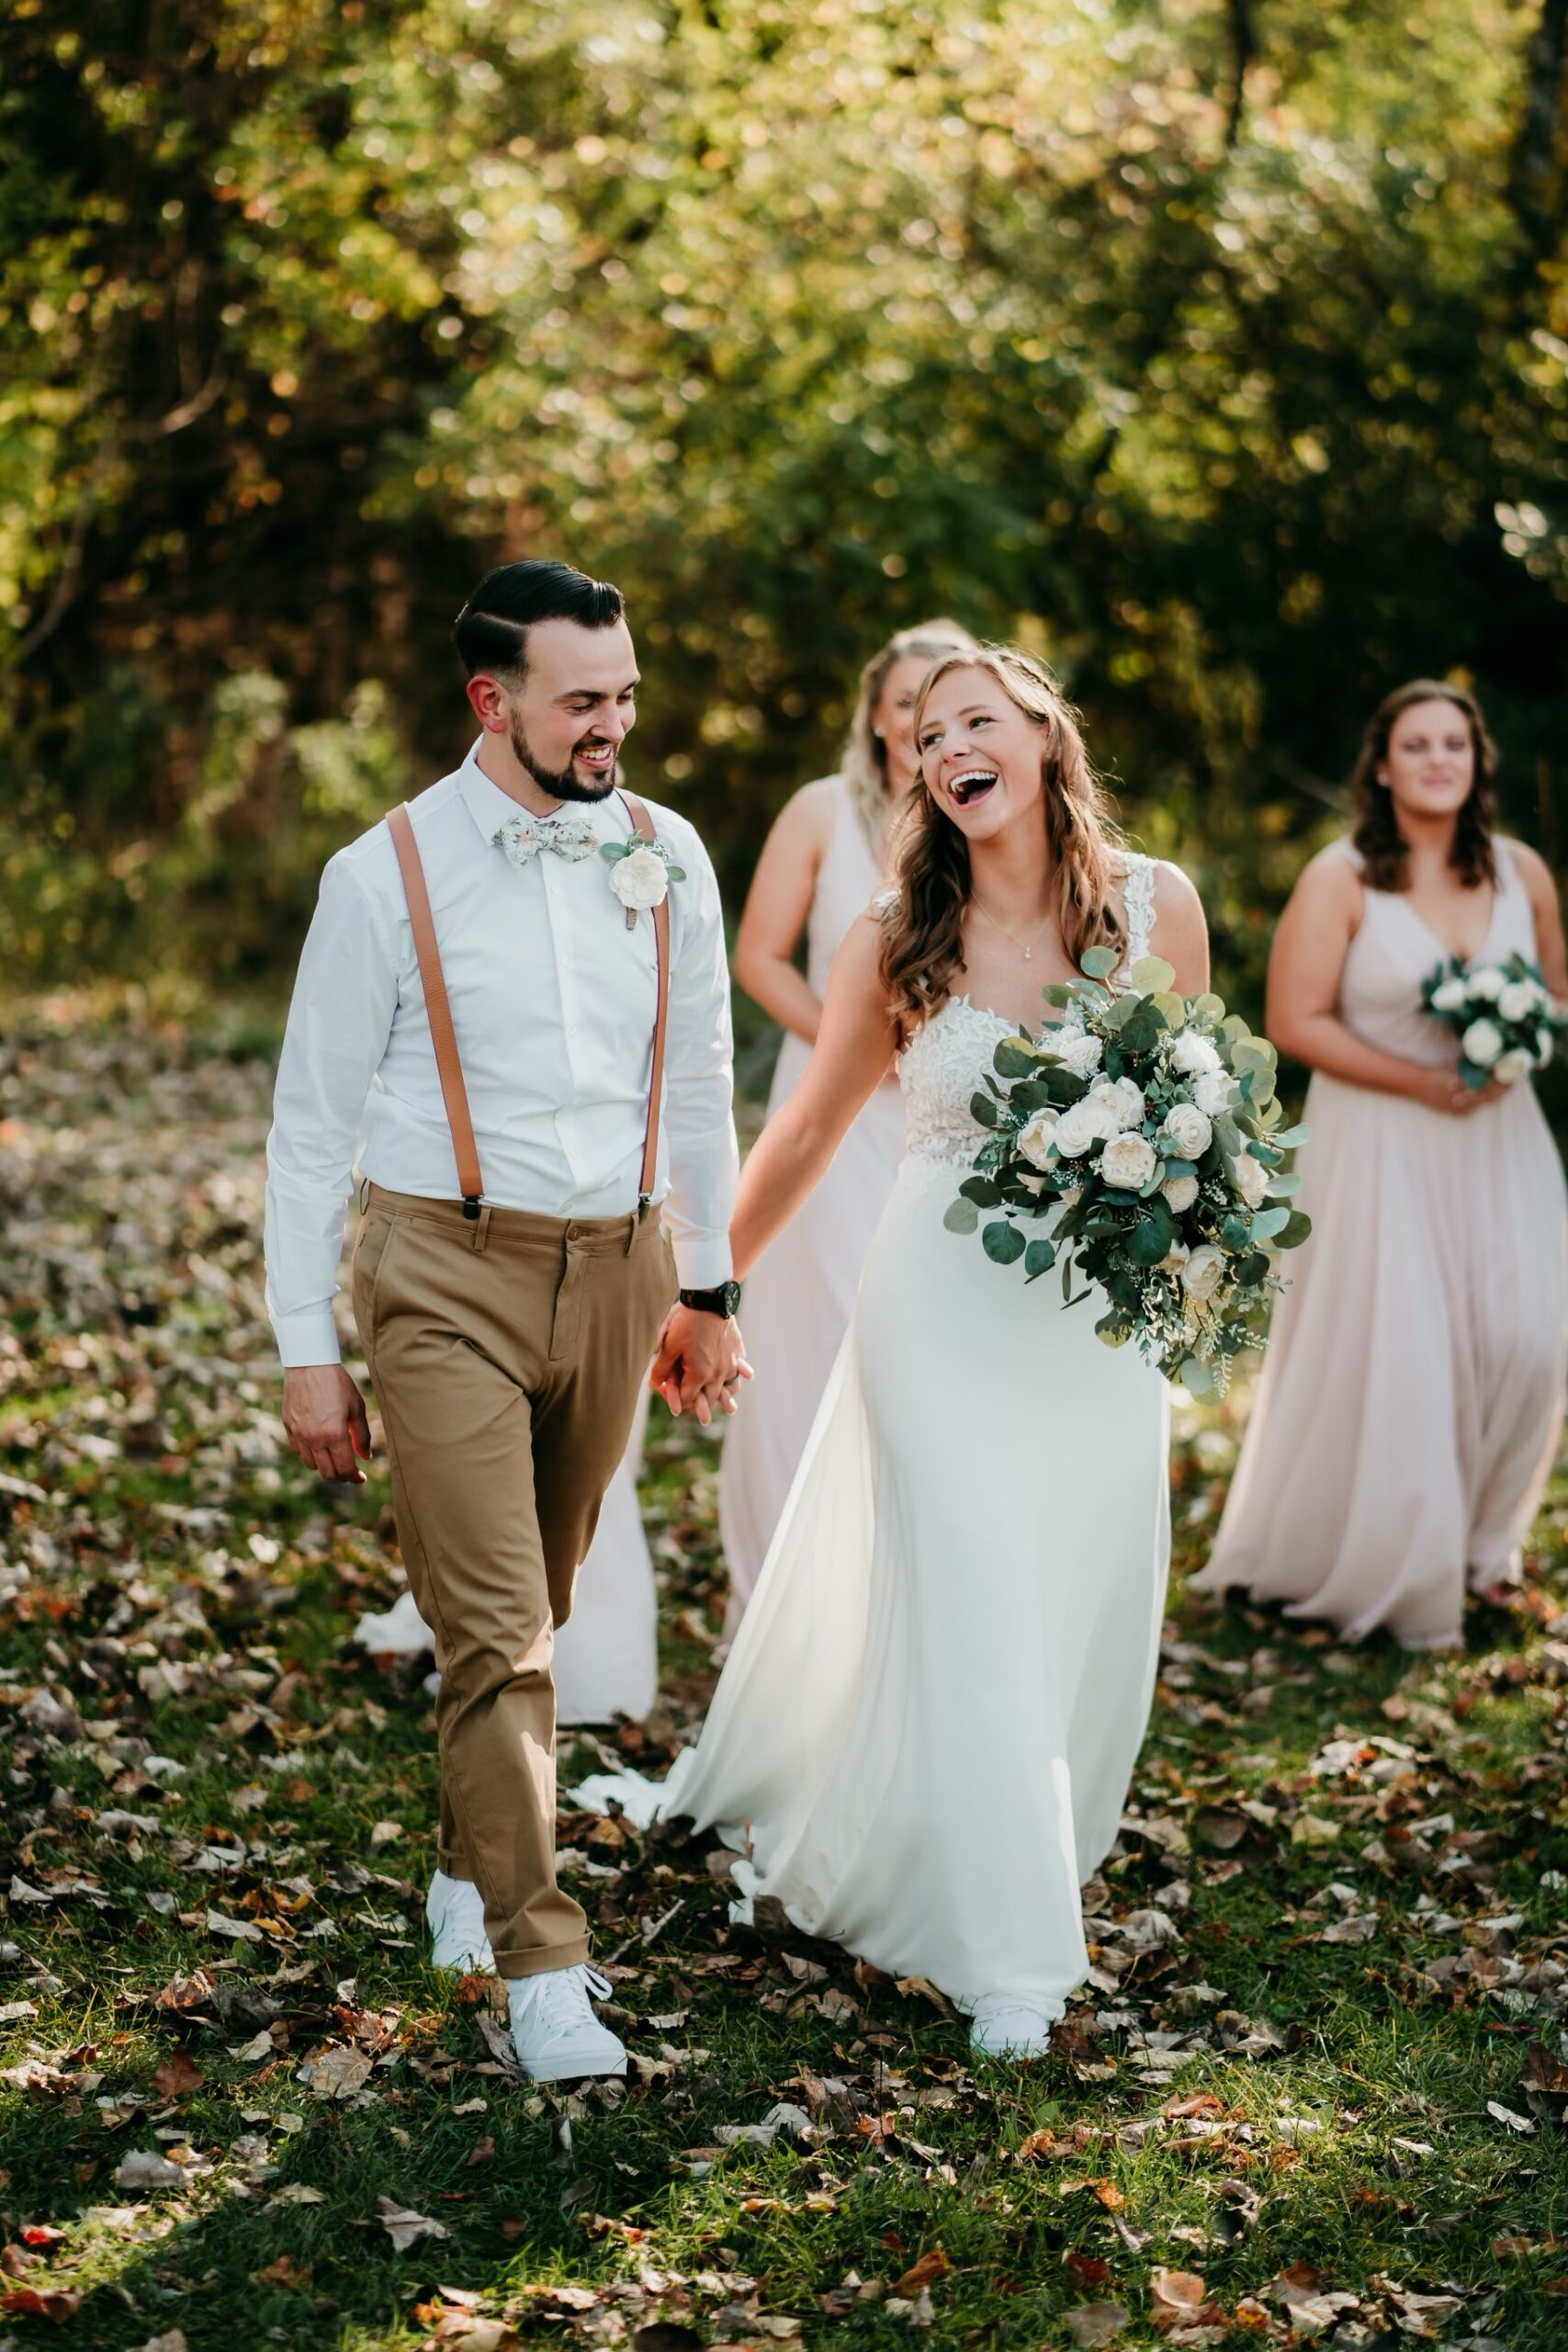 New England, tented wedding.